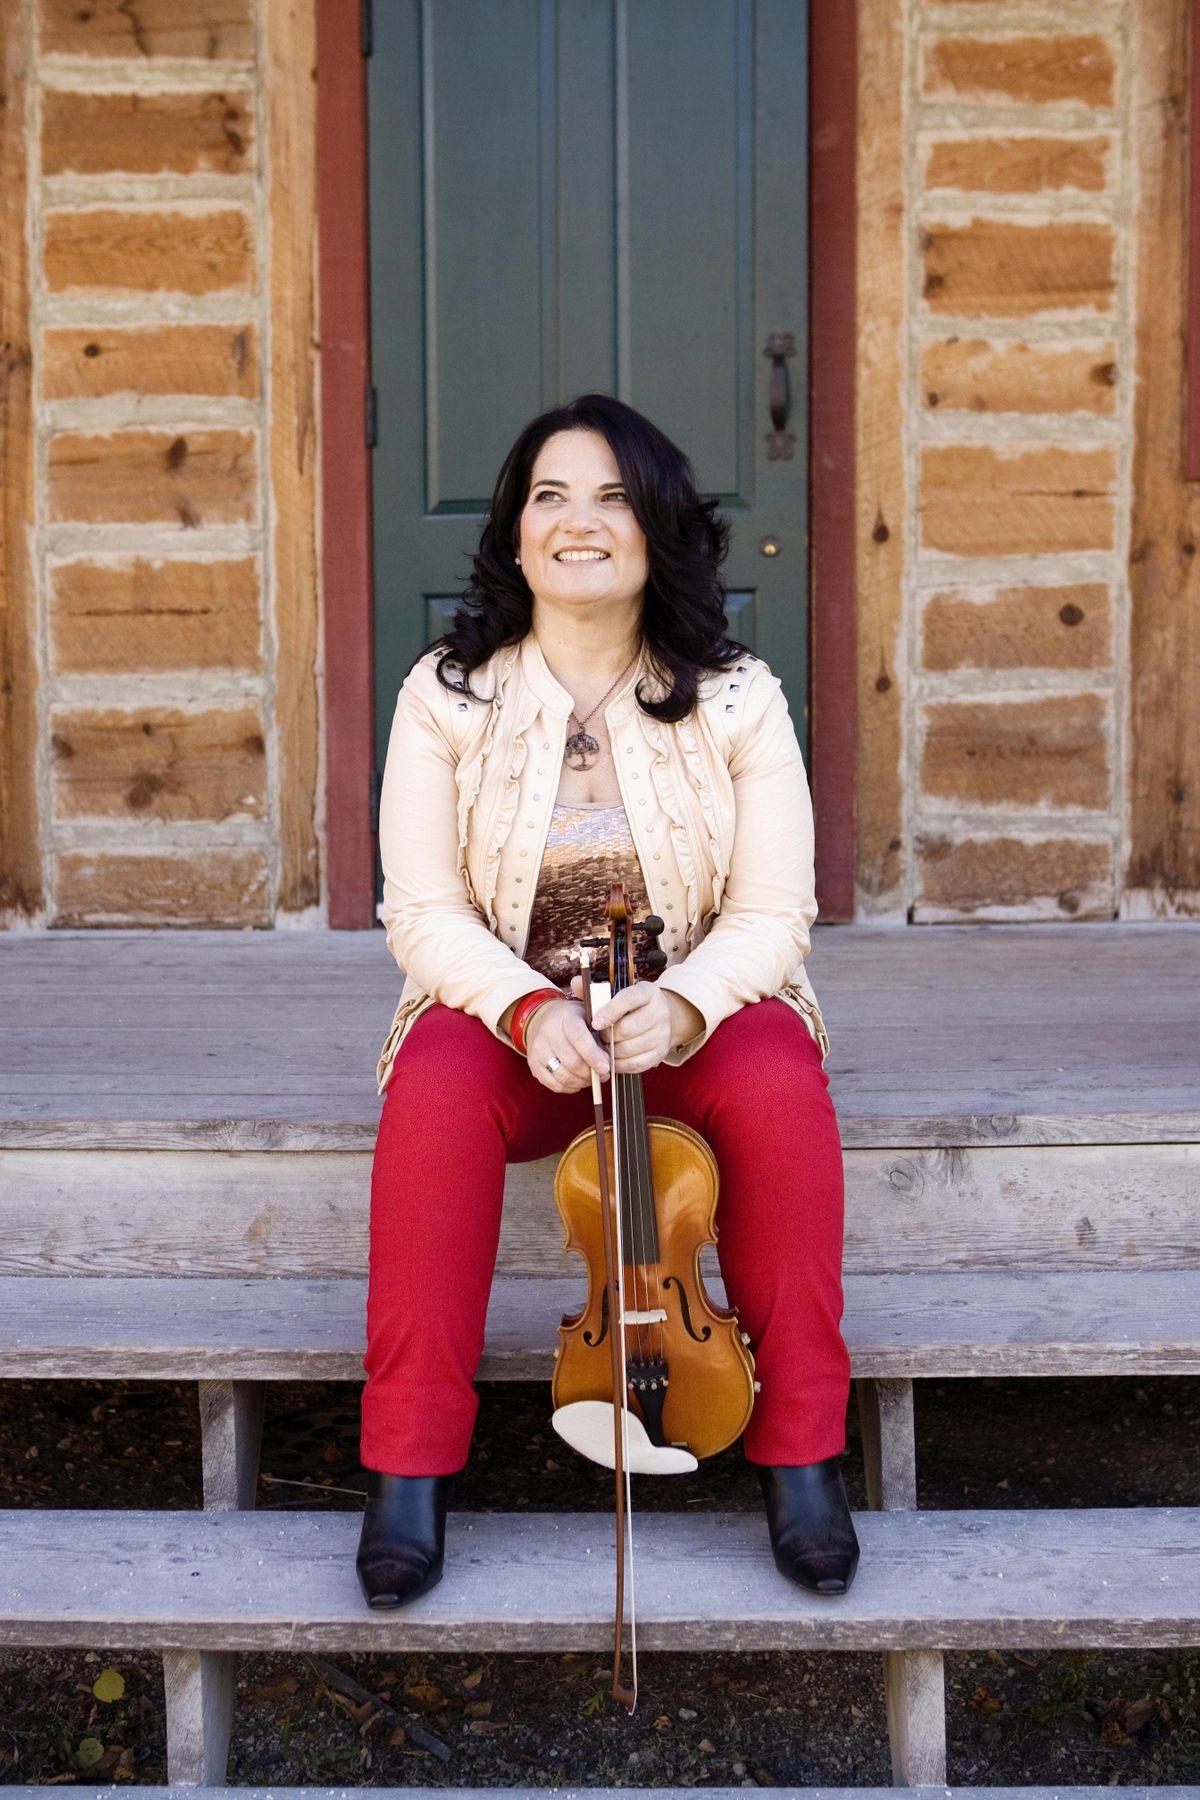 National Fiddling Day Concert with Patti Kusturok Jeremy Rusu The Chaisson Trio fiddlerlouise & co.  Gary Chipman